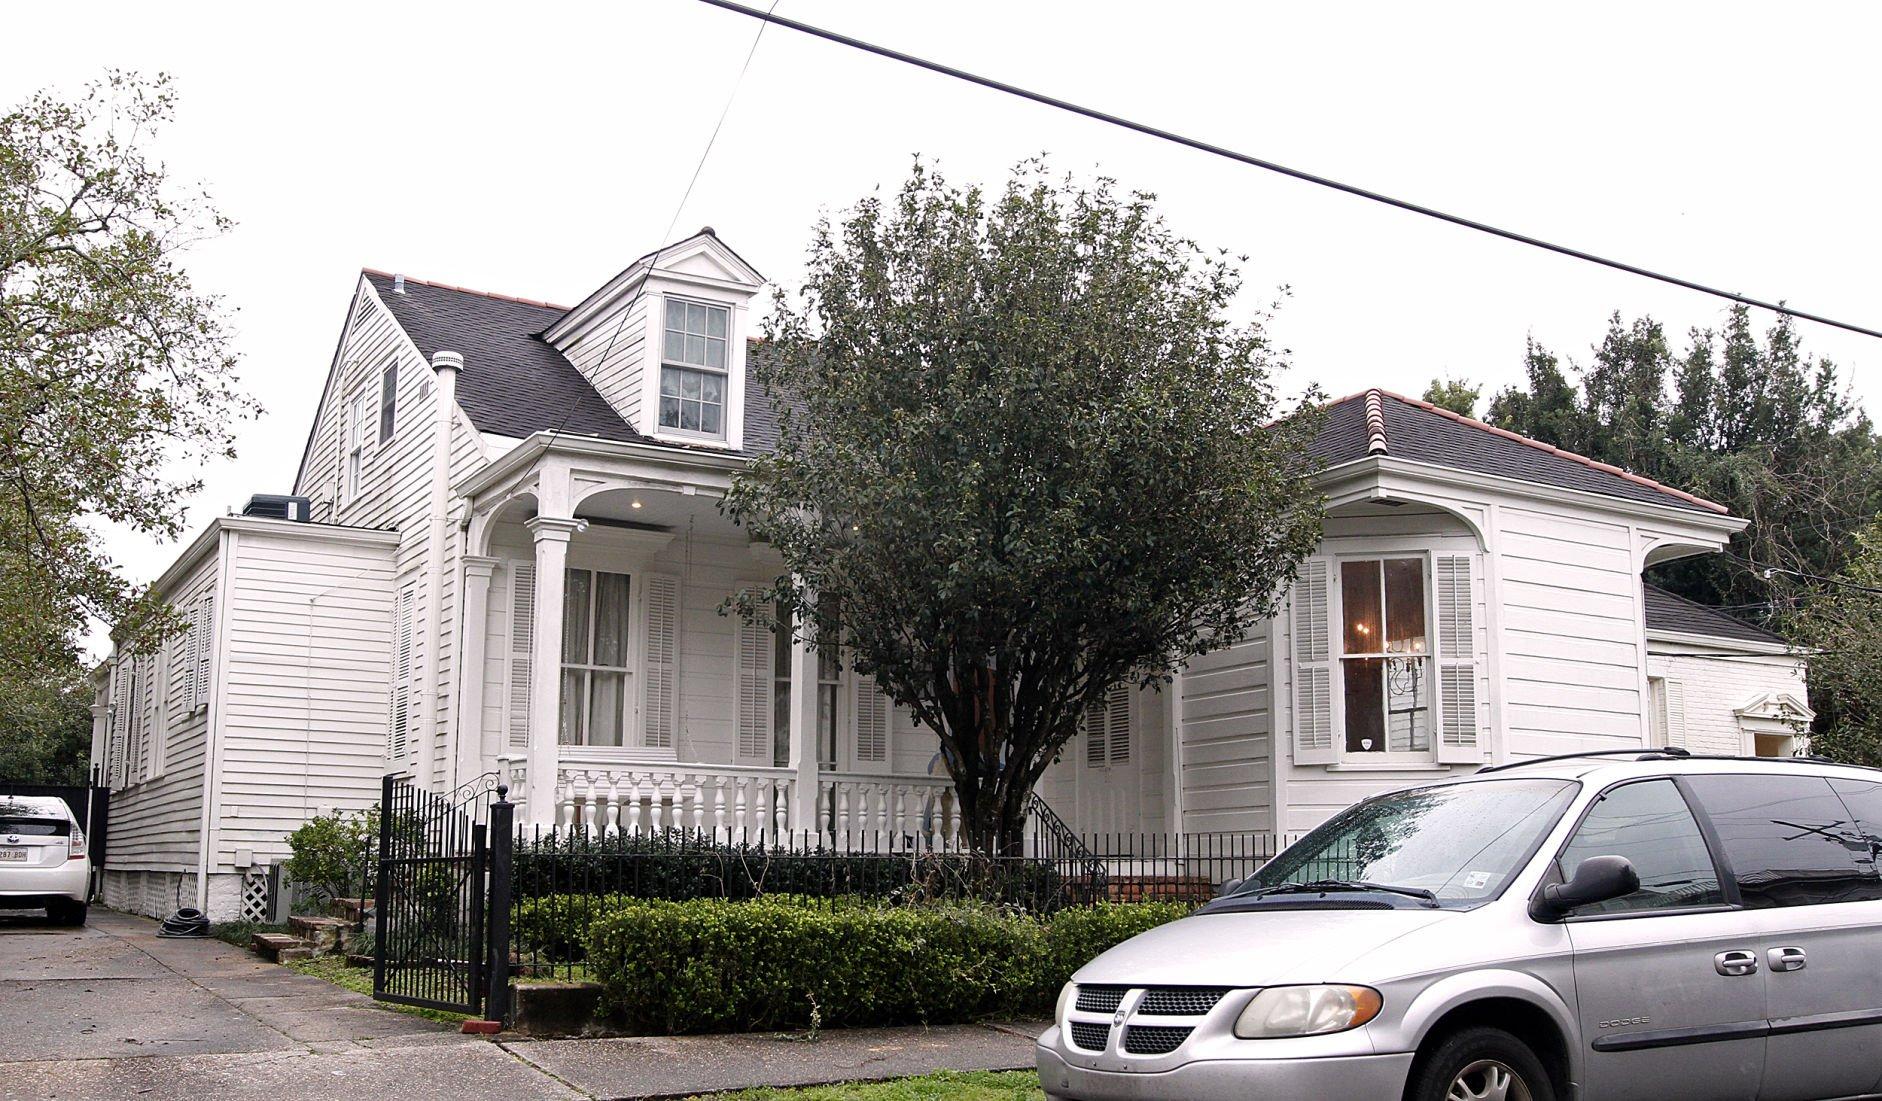 new orleans property transfers feb 4 8 2019 business rh theadvocate com